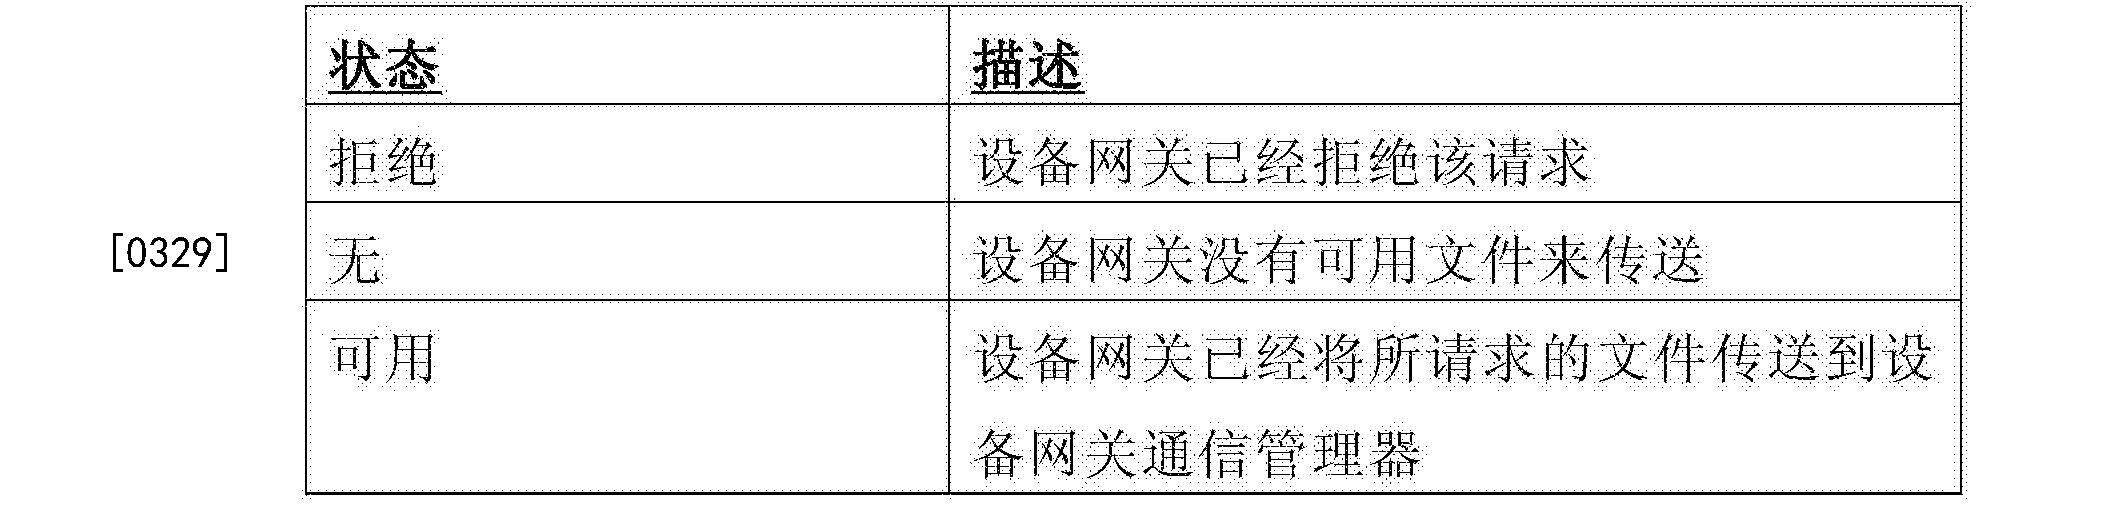 Figure CN108630308AD00434